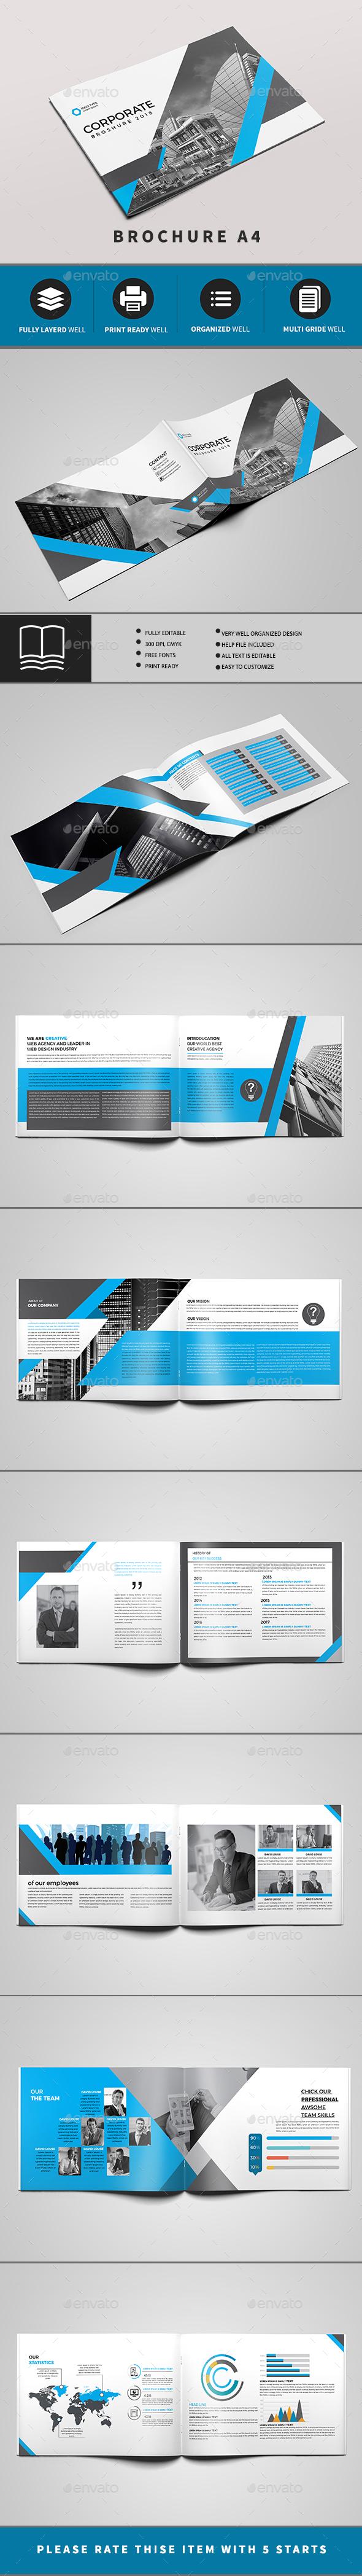 Corporate Brochure 16 PAGE - Brochures Print Templates